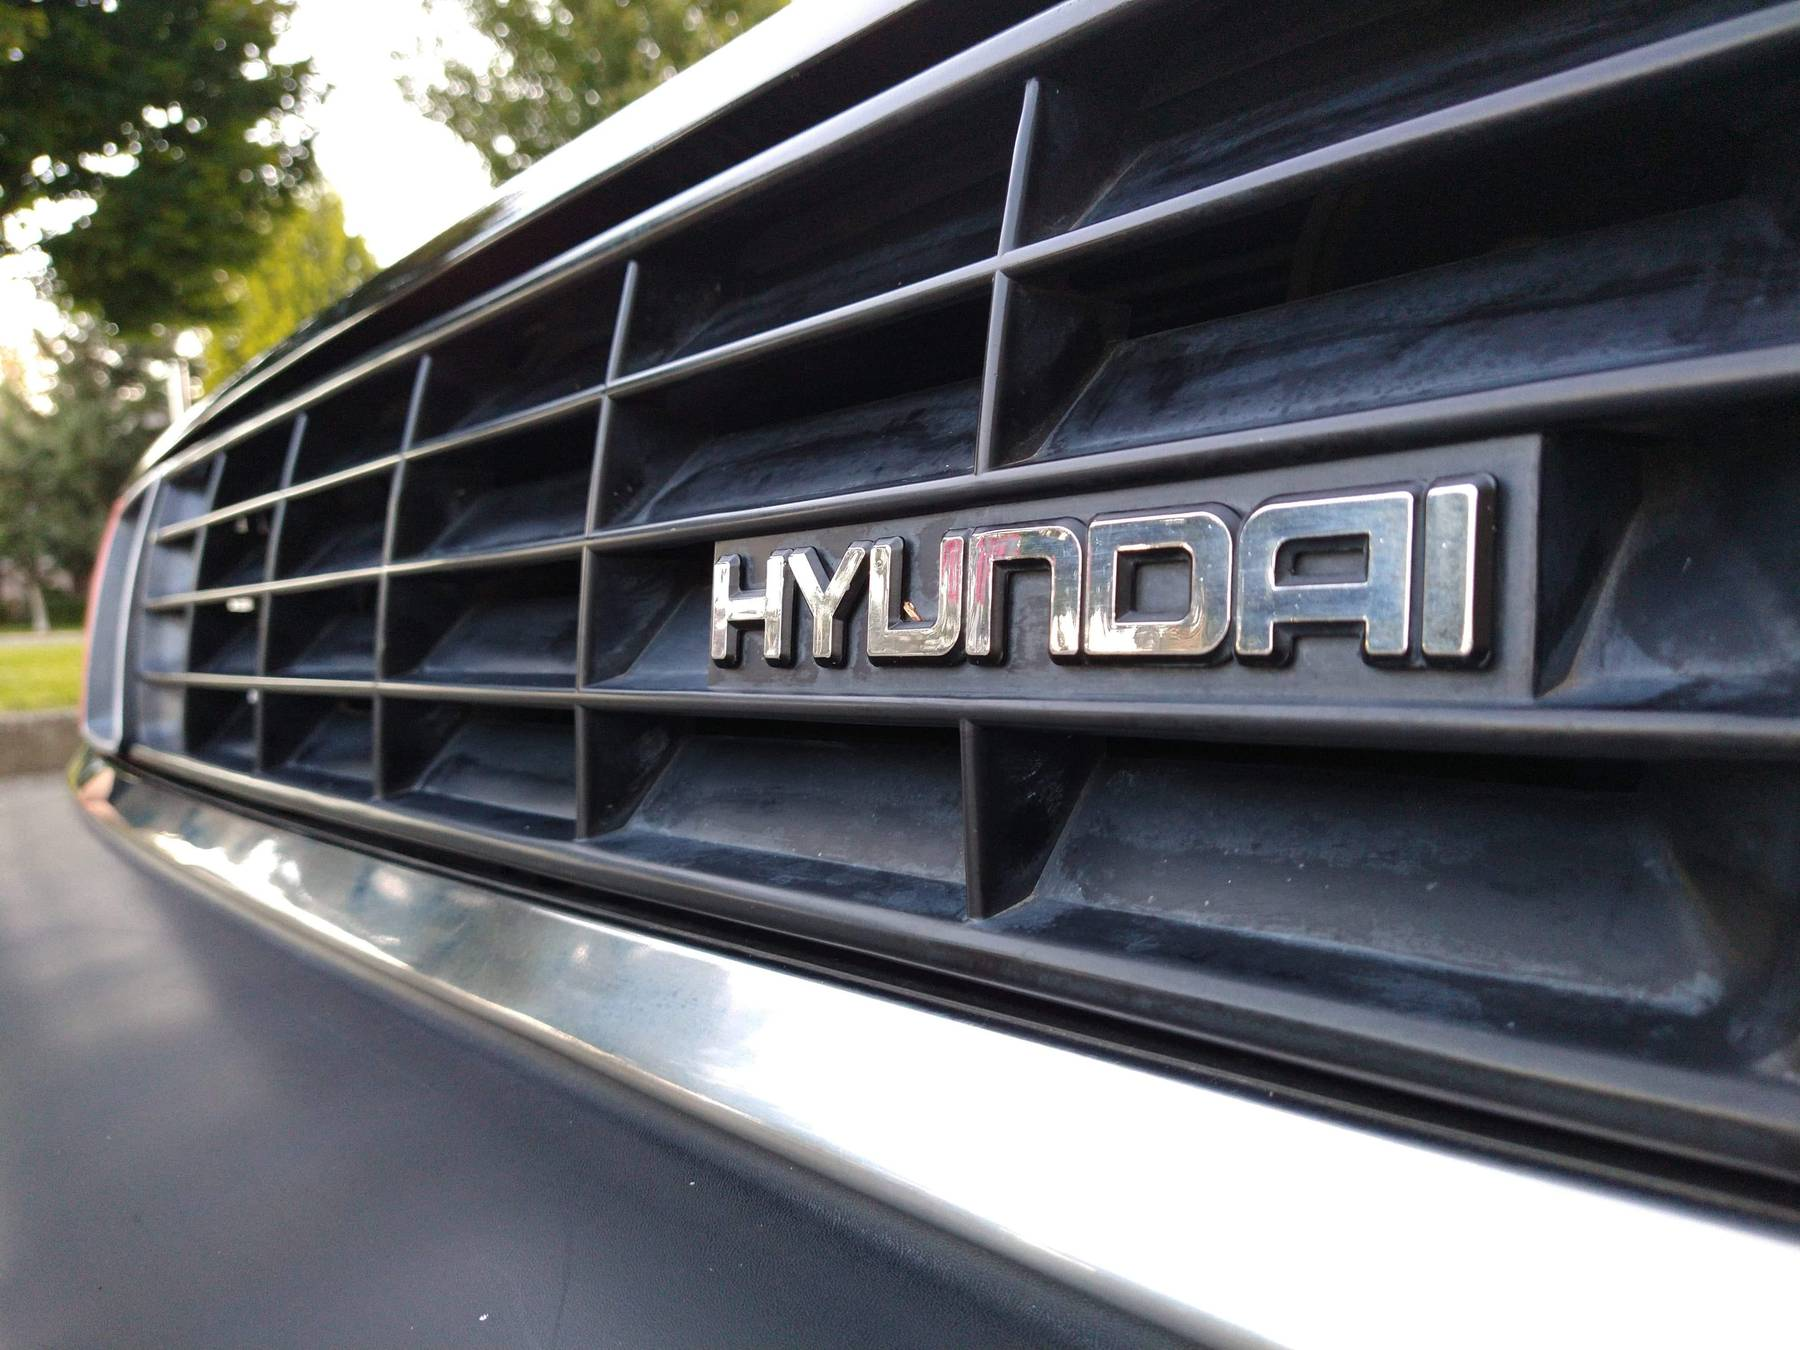 1986 Hyundai Stellar Executive front grille emblem